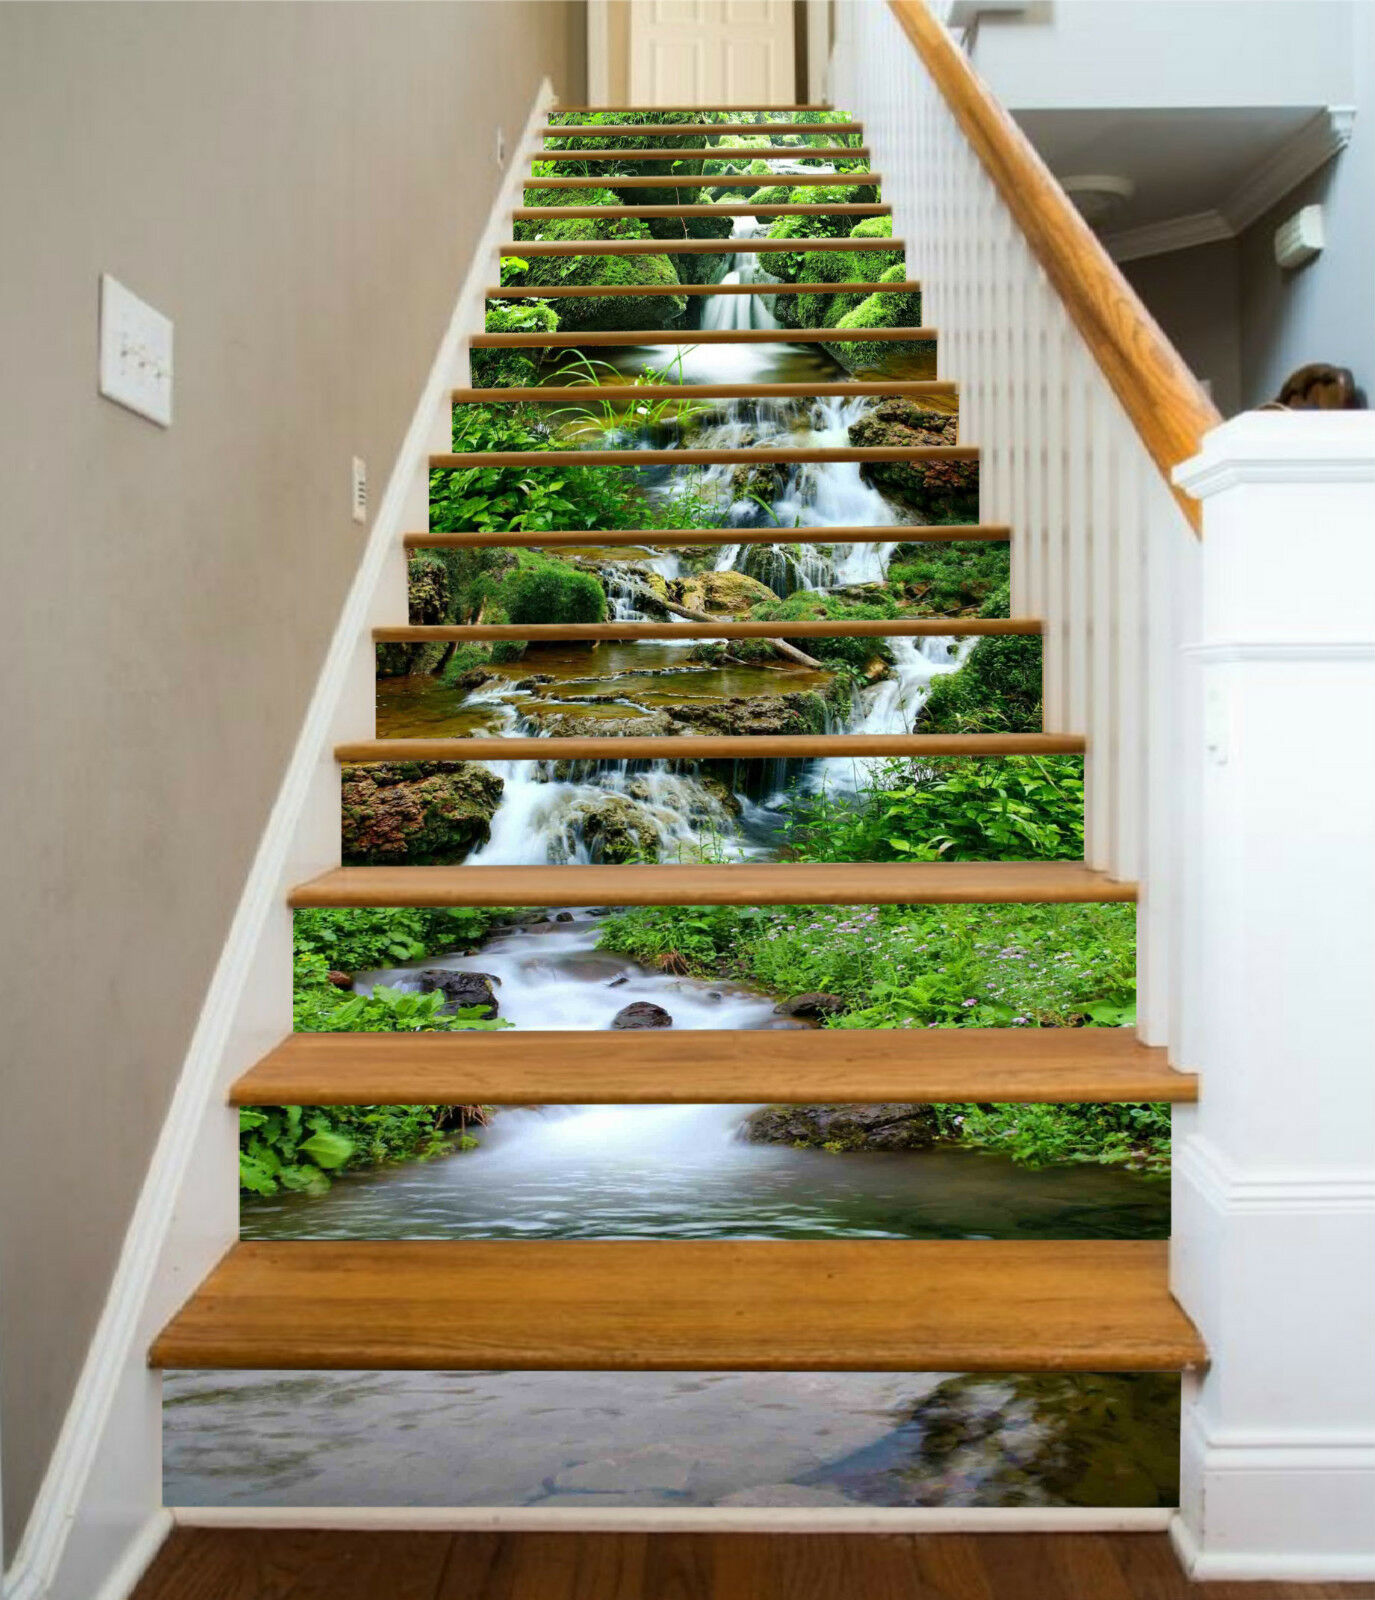 3D green Baches 252 Stair Risers Dekoration Fototapete Vinyl Aufkleber Tapete DE